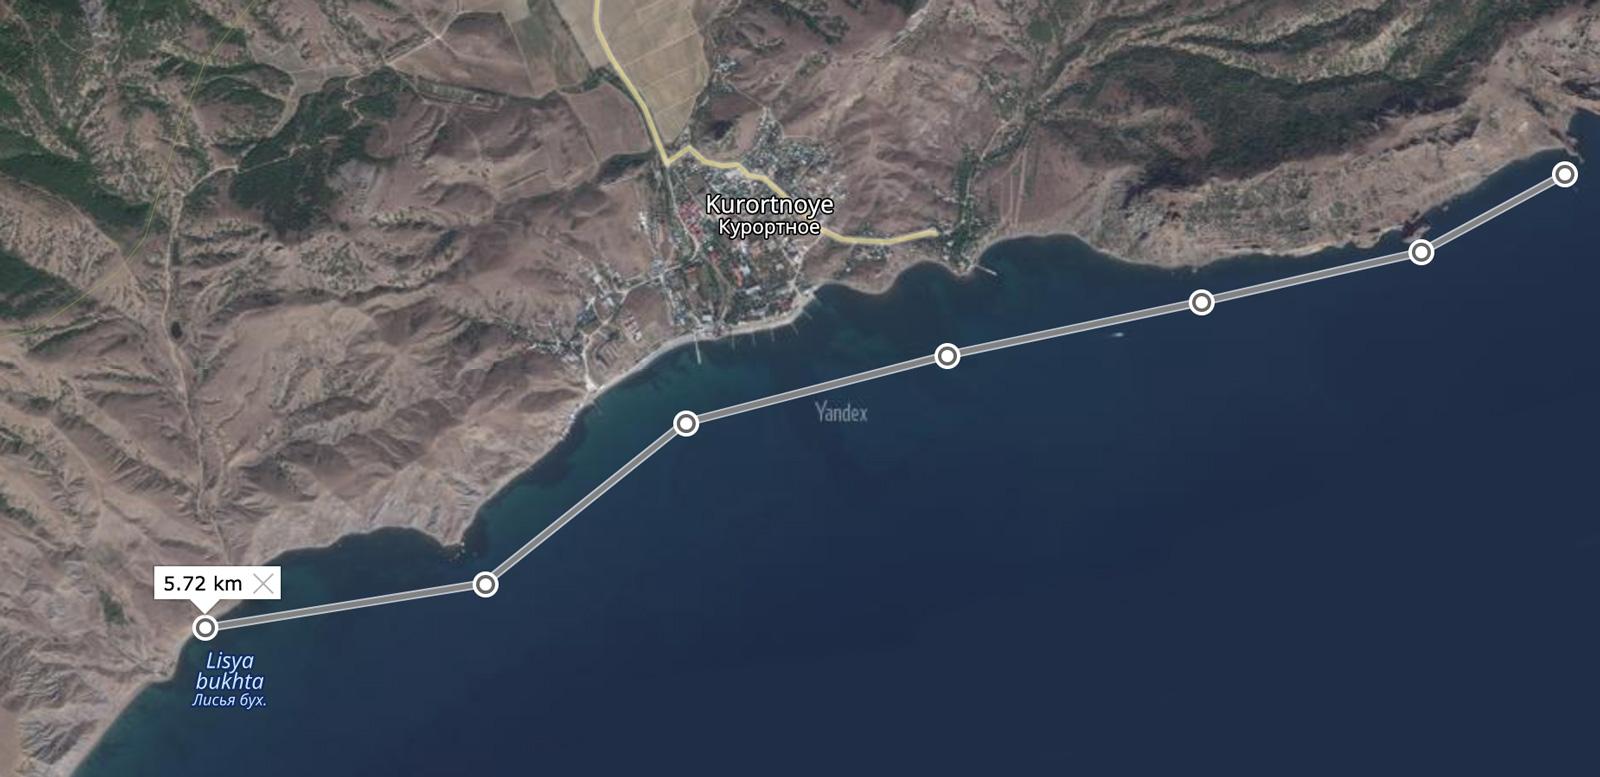 julia-karpacheva-paddleboarding-russia-black-sea-paddle-gps-map-route